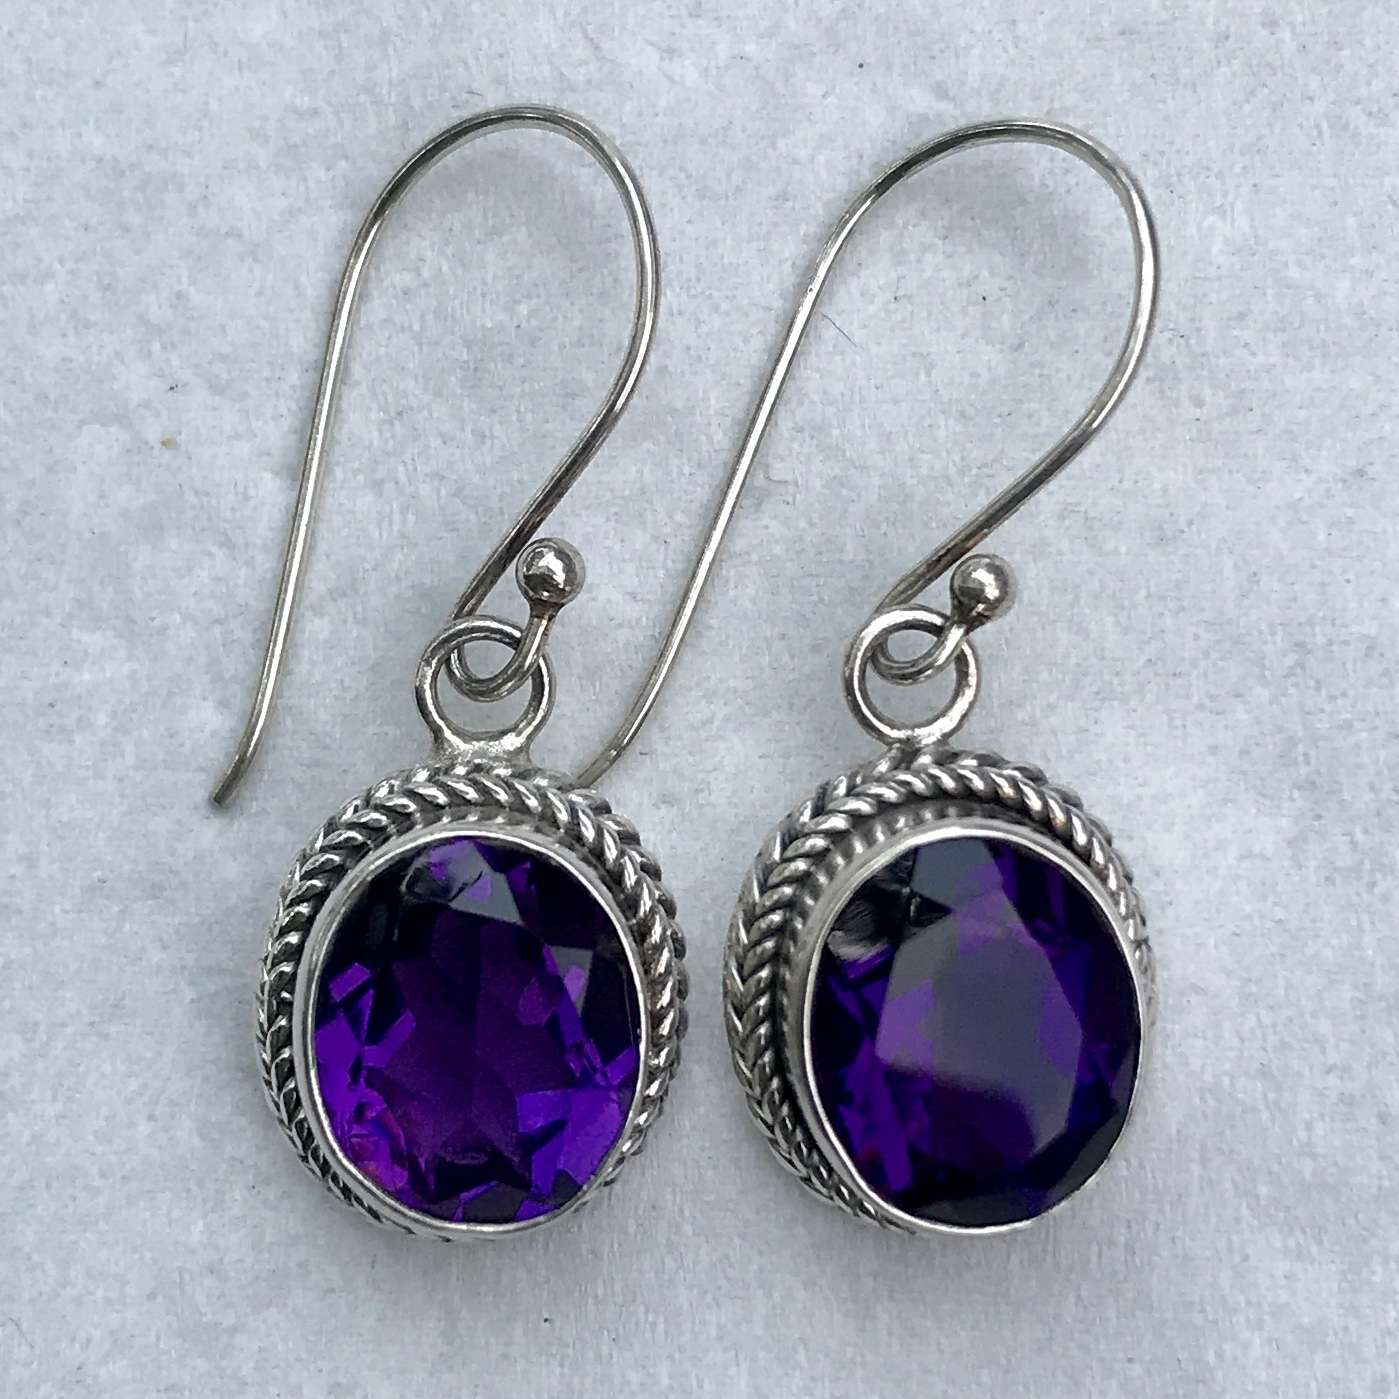 Er 12569 B Am Bali Silver Earrings With Amethyst